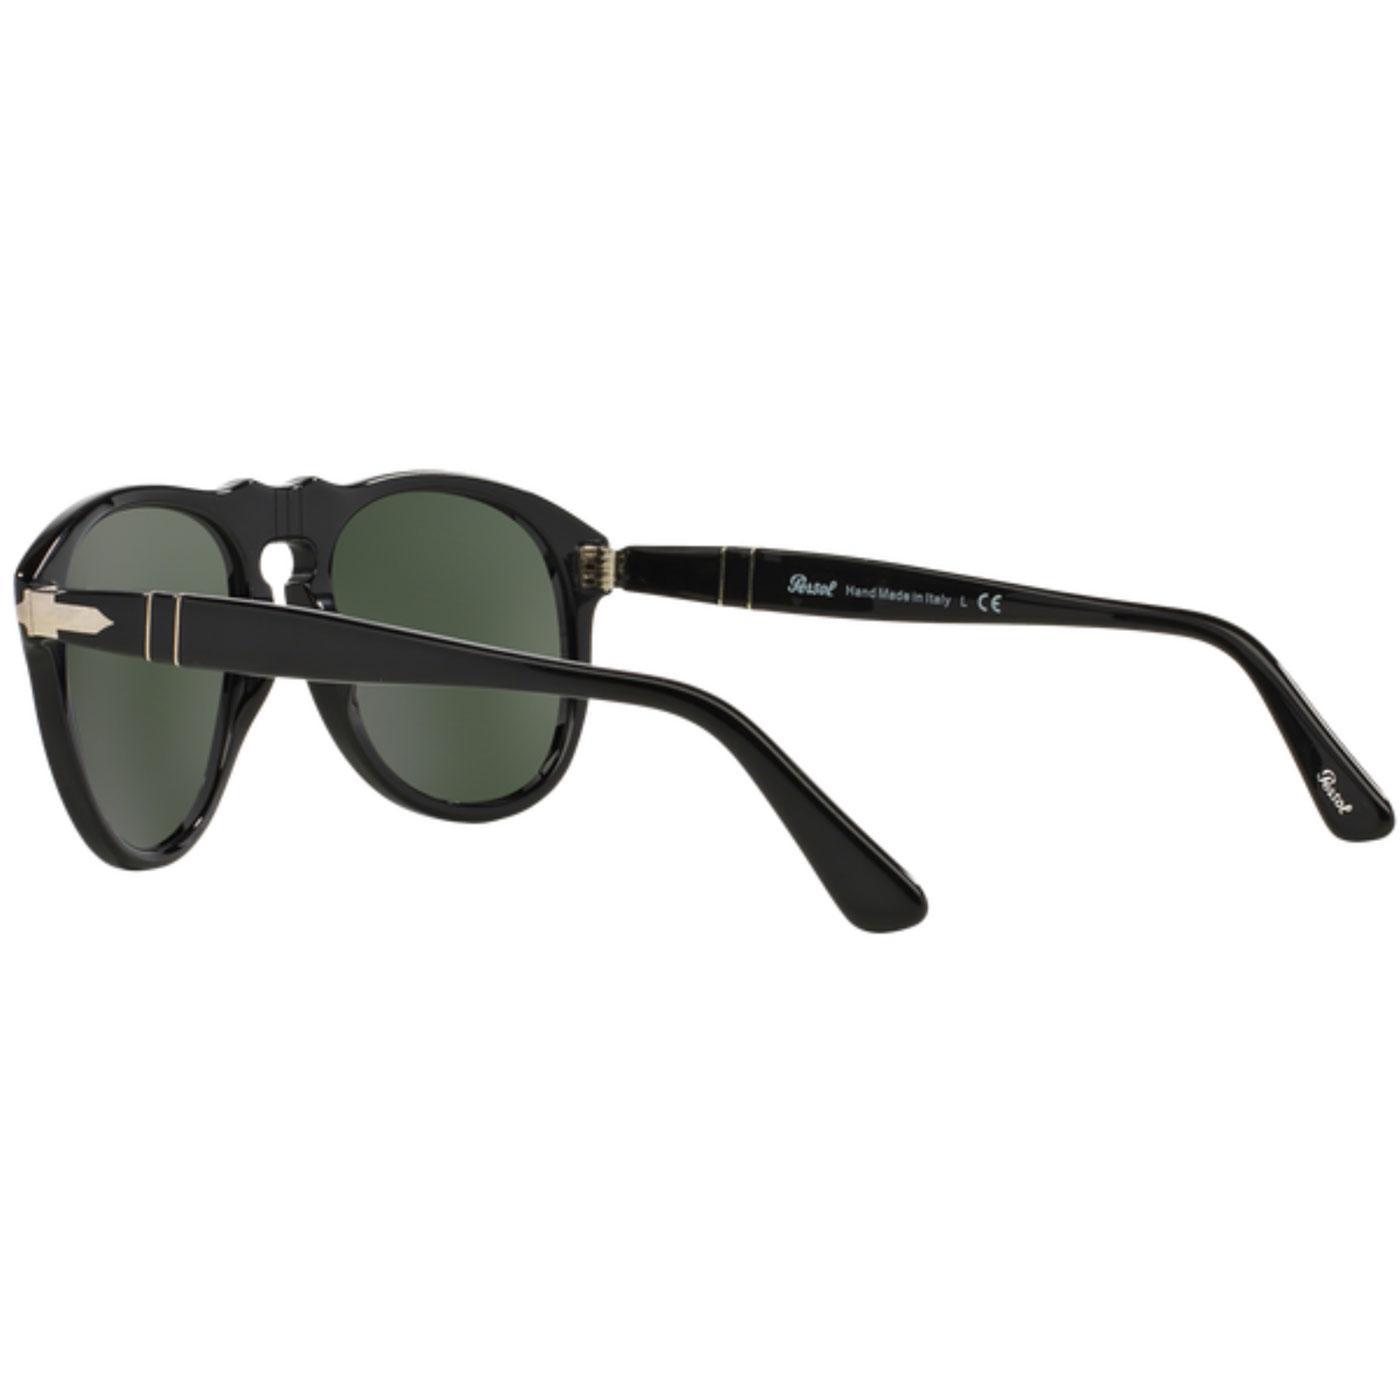 90e701edf32c PERSOL 649 Series Original Mens Mod Sunglasses in Black